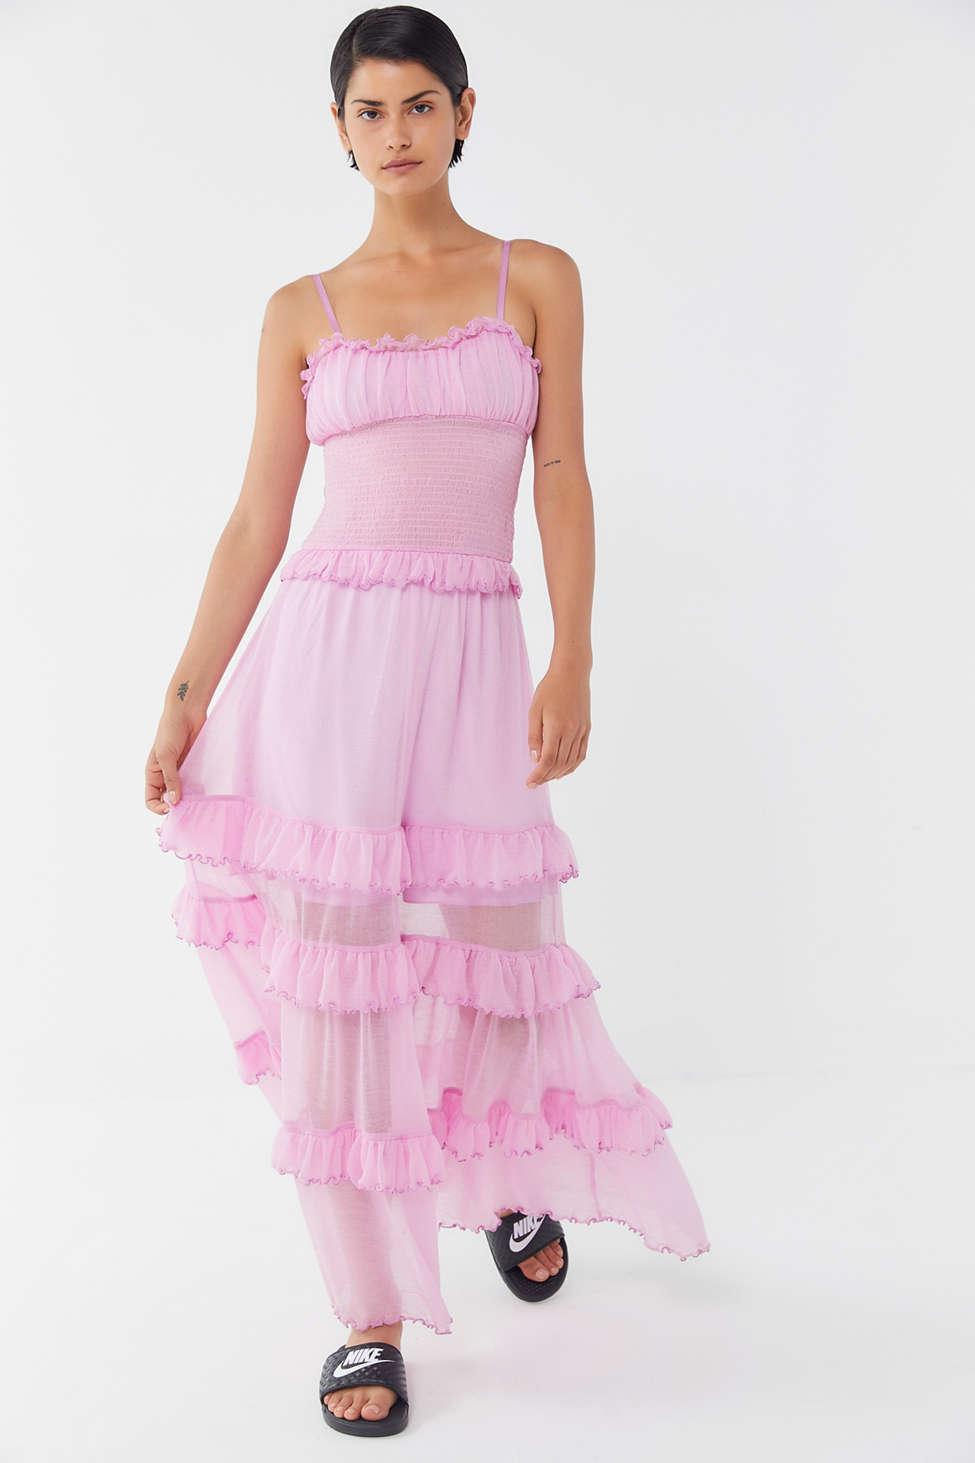 732082c63b Urban Outfitters - Pink Uo Tampa Gauze Tiered Ruffle Maxi Dress - Lyst.  View fullscreen